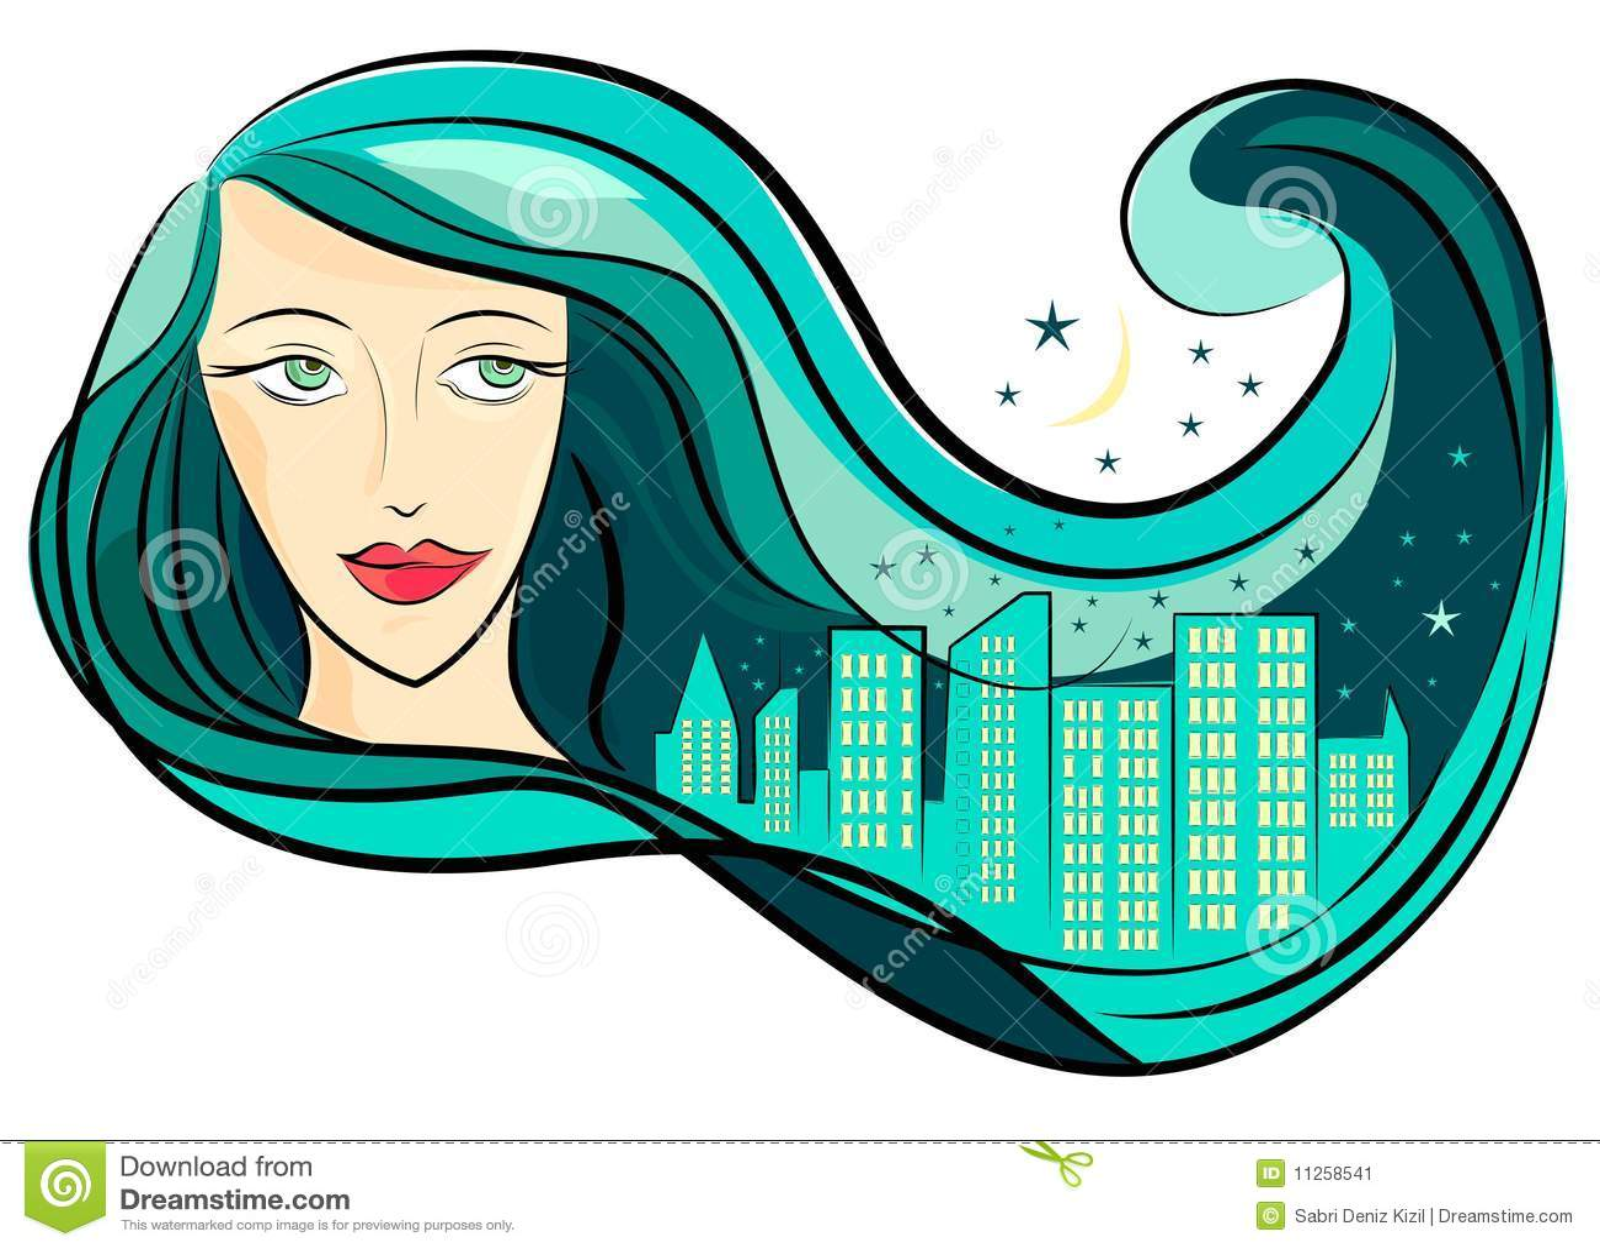 вектор волос девушки города